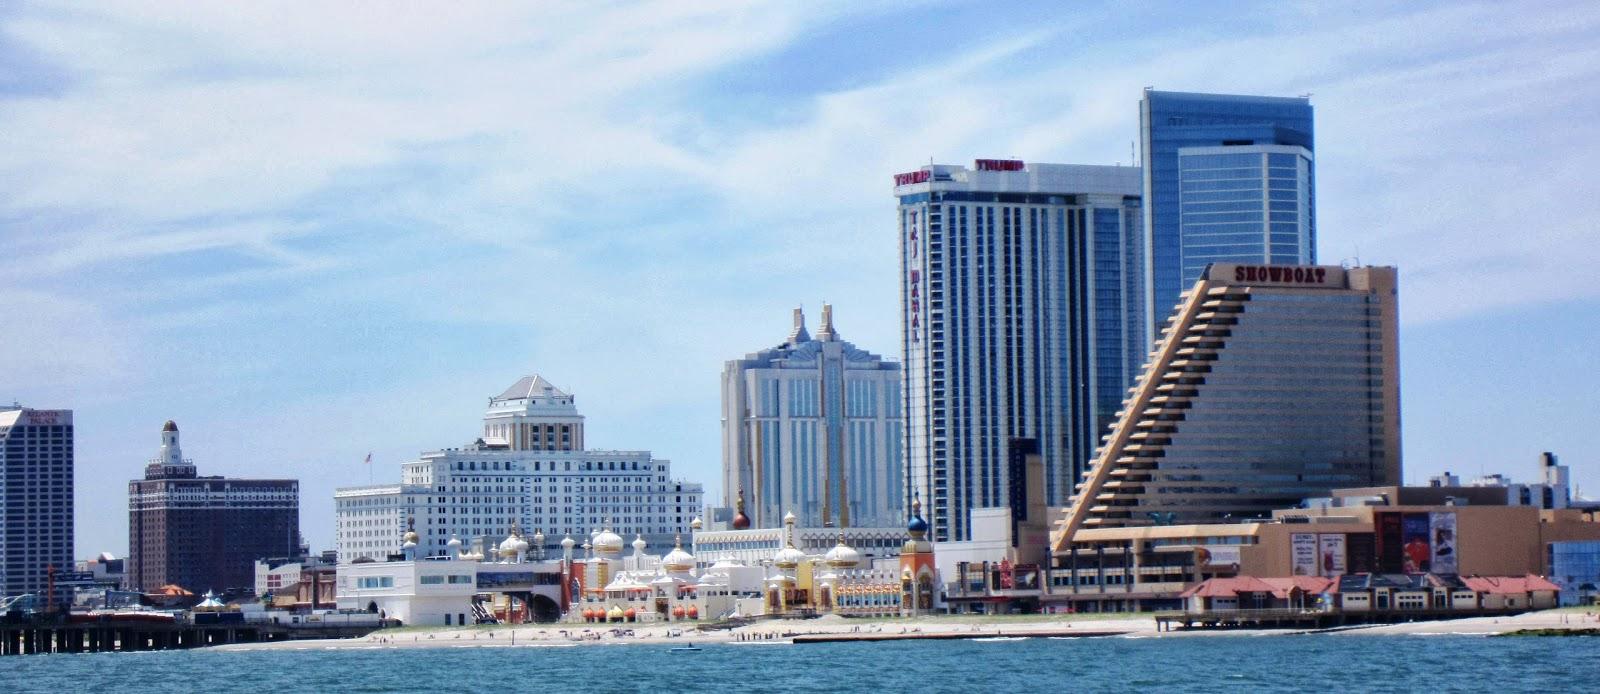 6 5 2013 cape may to atlantic city nj go 39 s travels Atlantic city aquarium hours